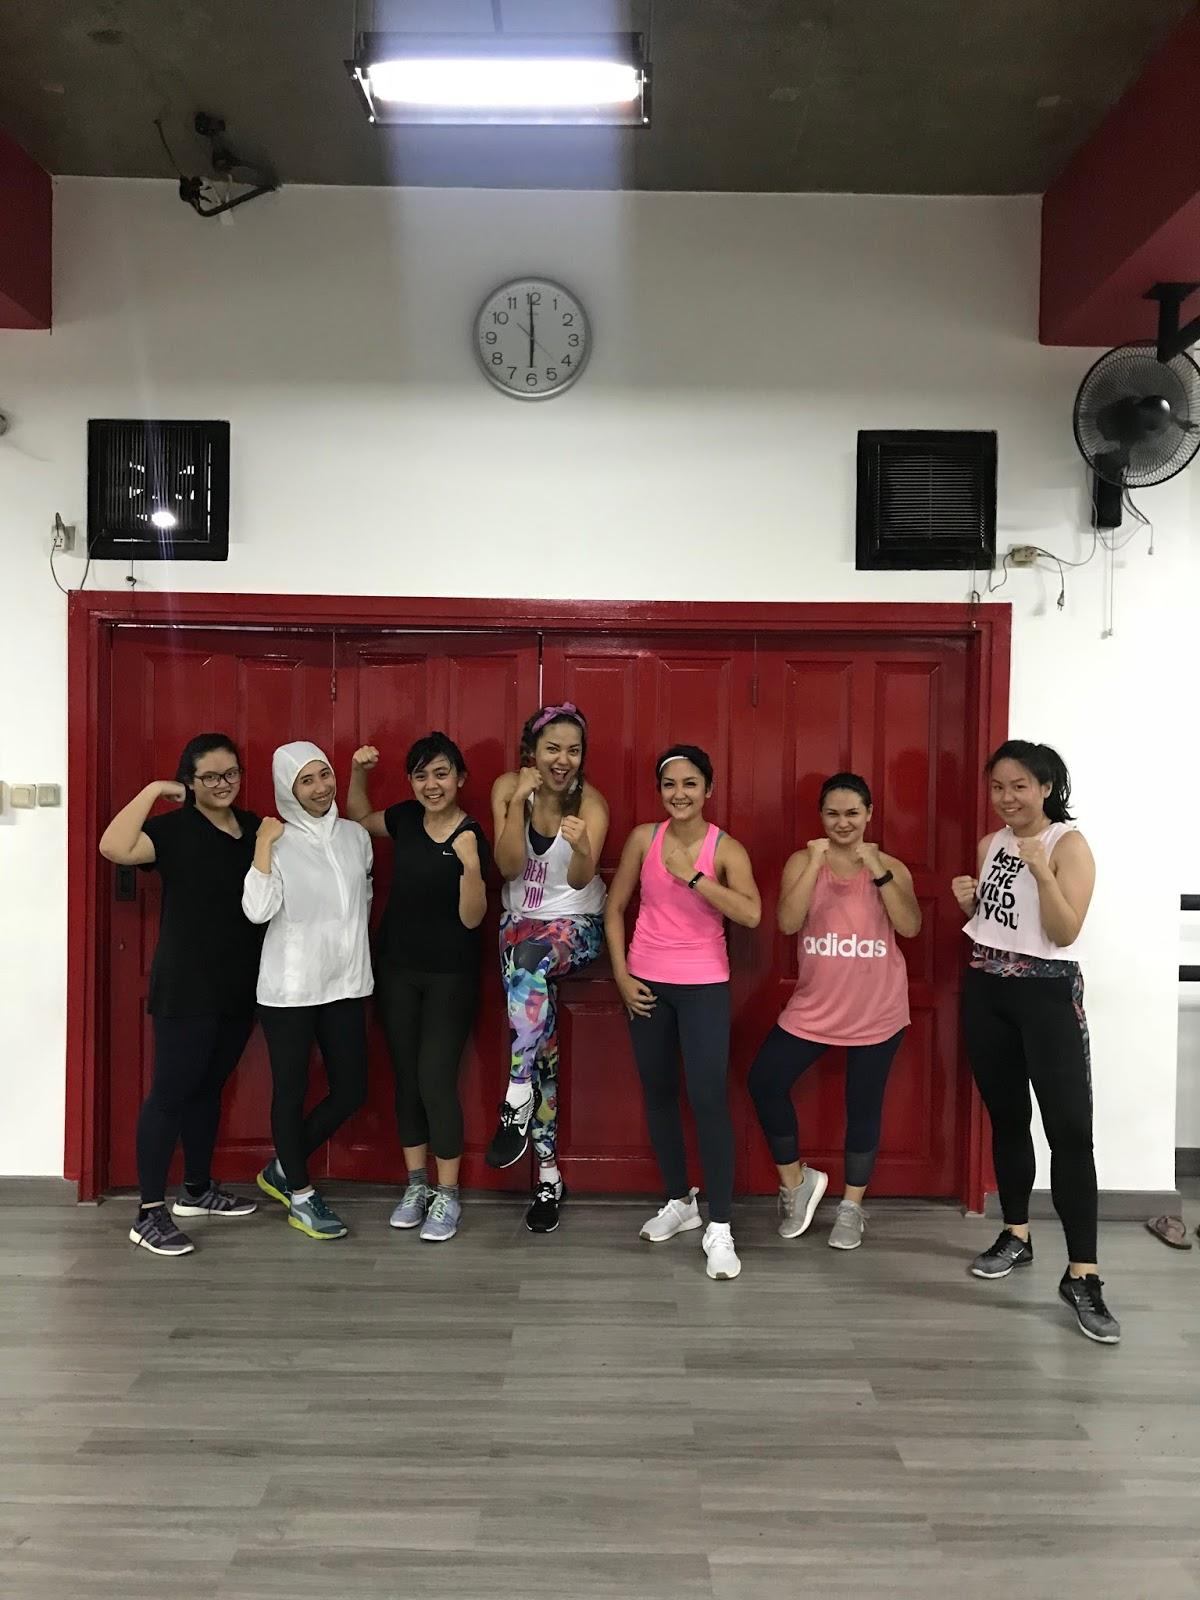 Dance yang Viral di Korea, Bantu Turunkan Berat Badan 10 Kg dalam 2 Minggu